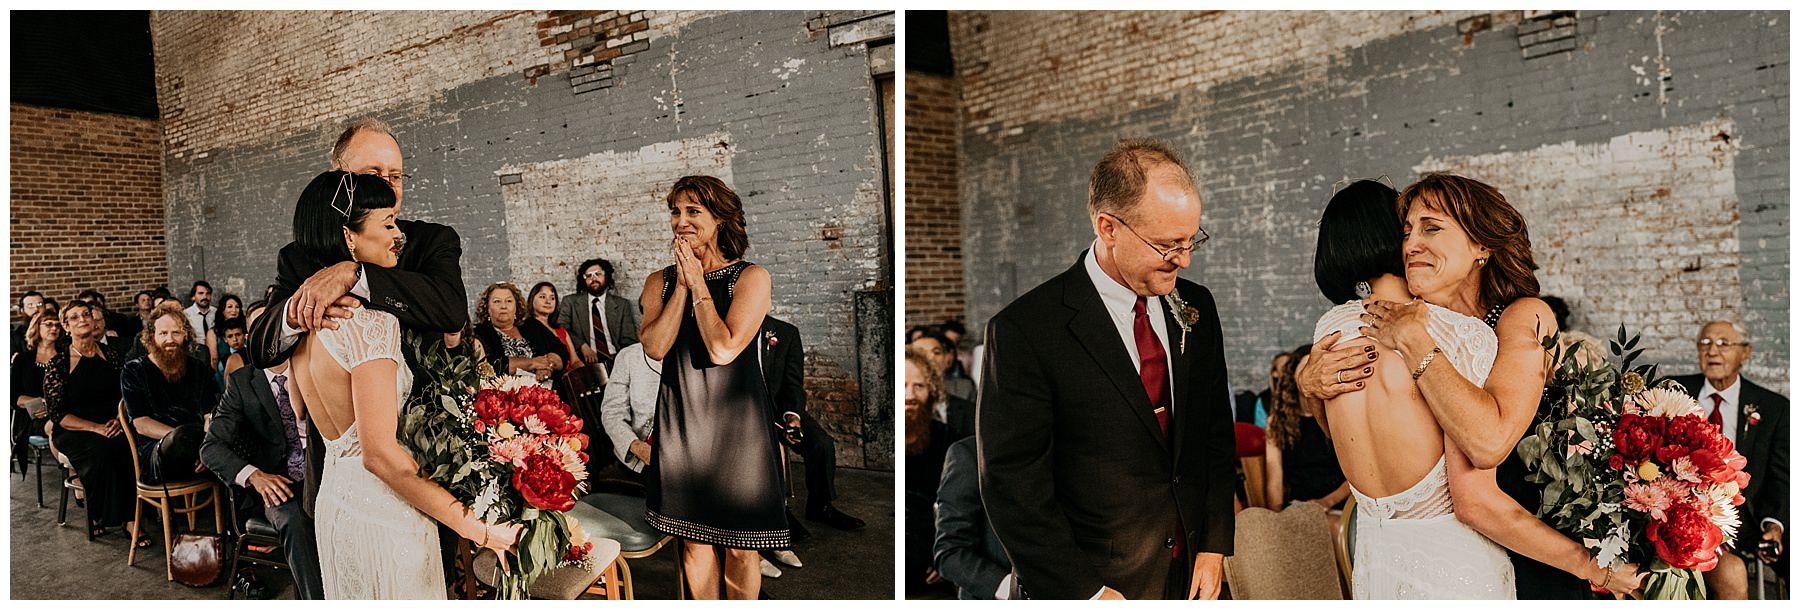 Jon and Jen New York Wedding-105.jpg